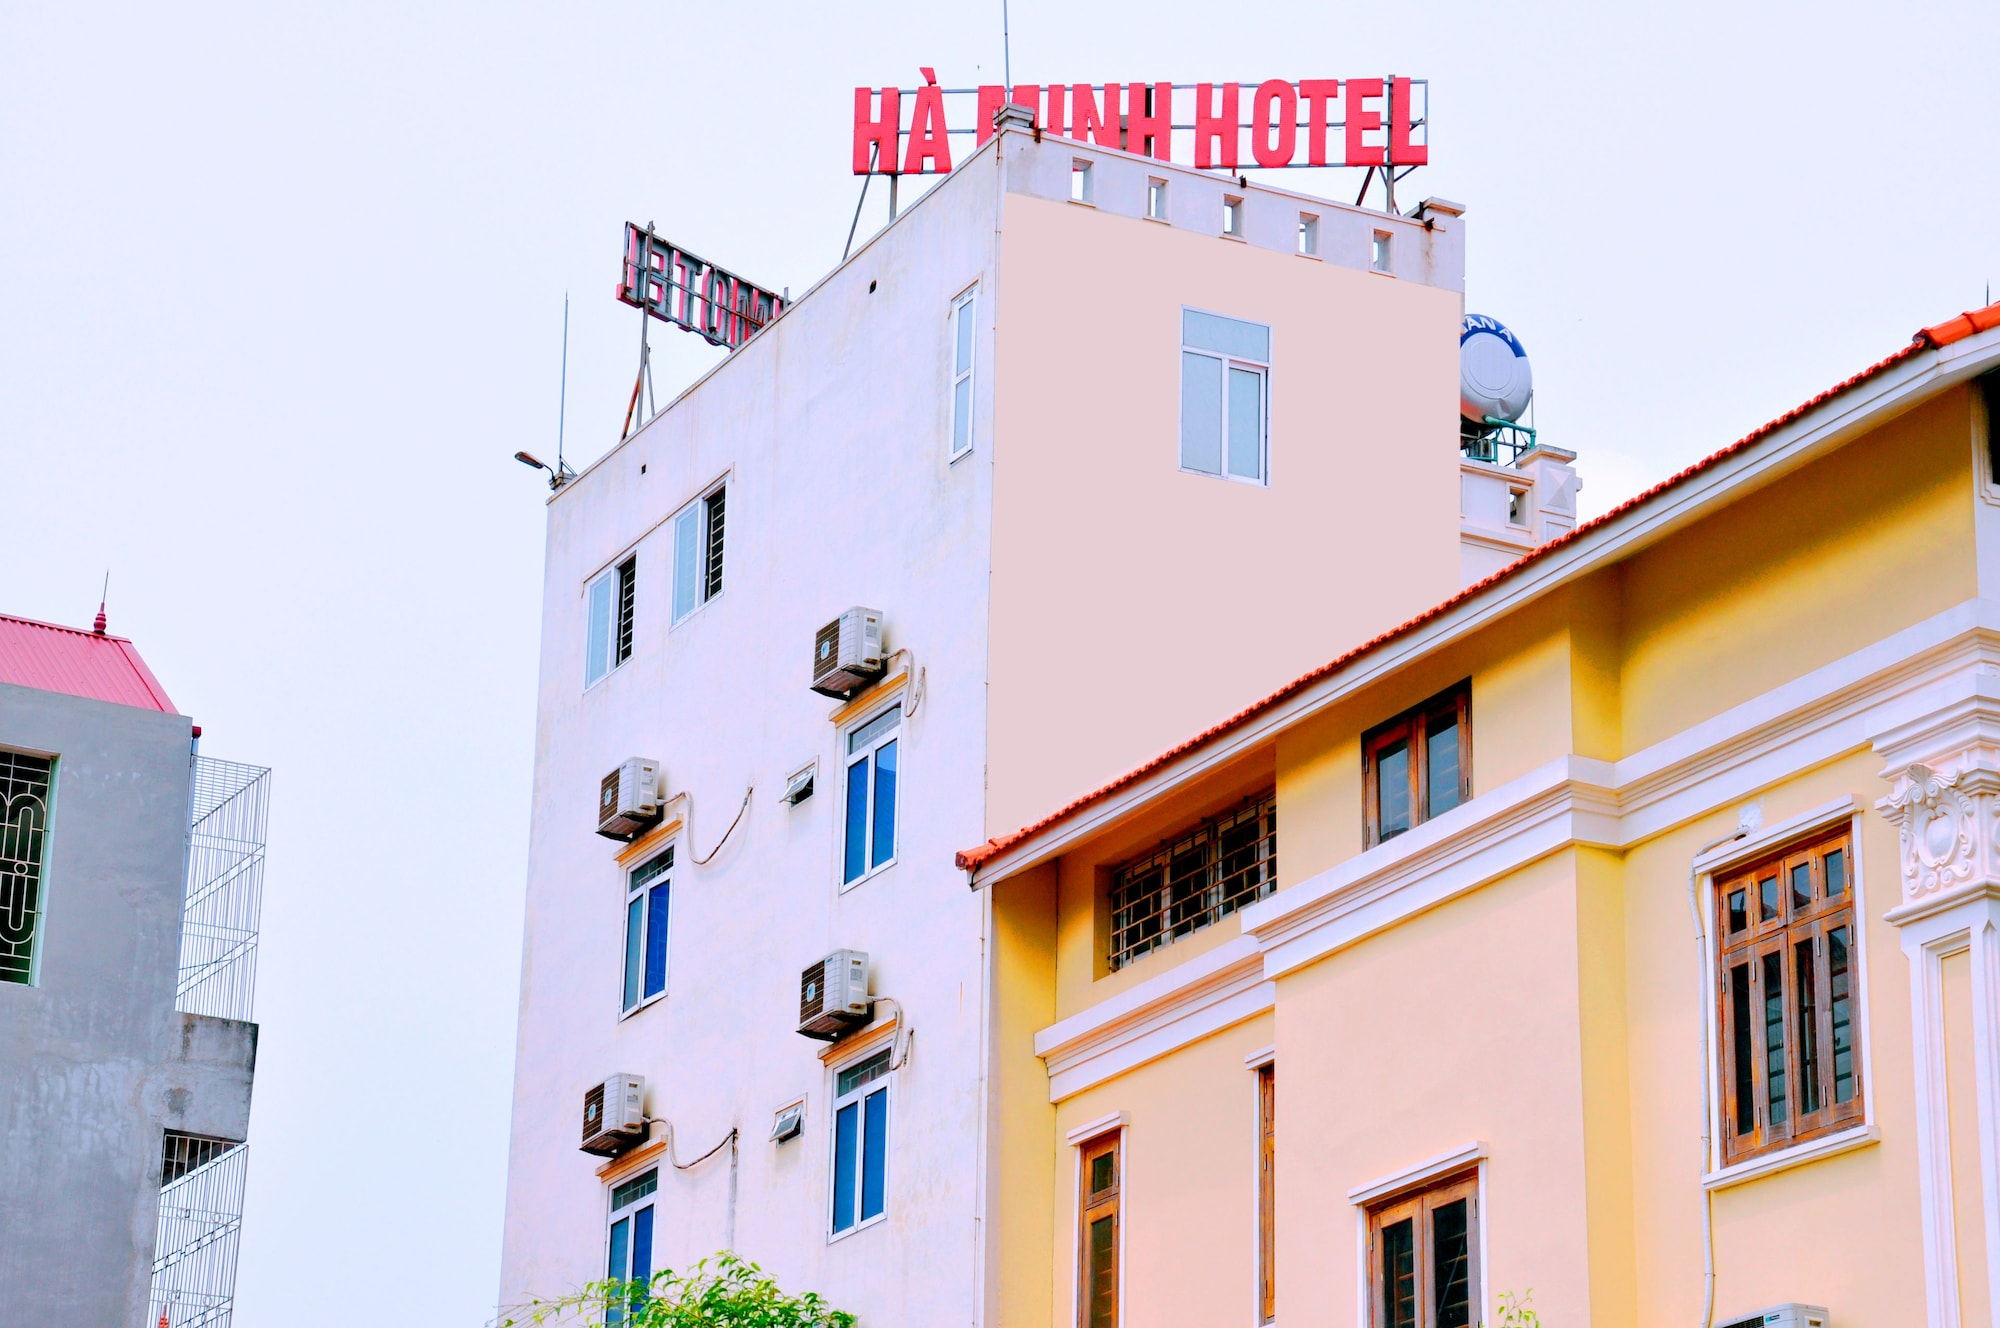 Ha Minh Hotel, Ninh Bình